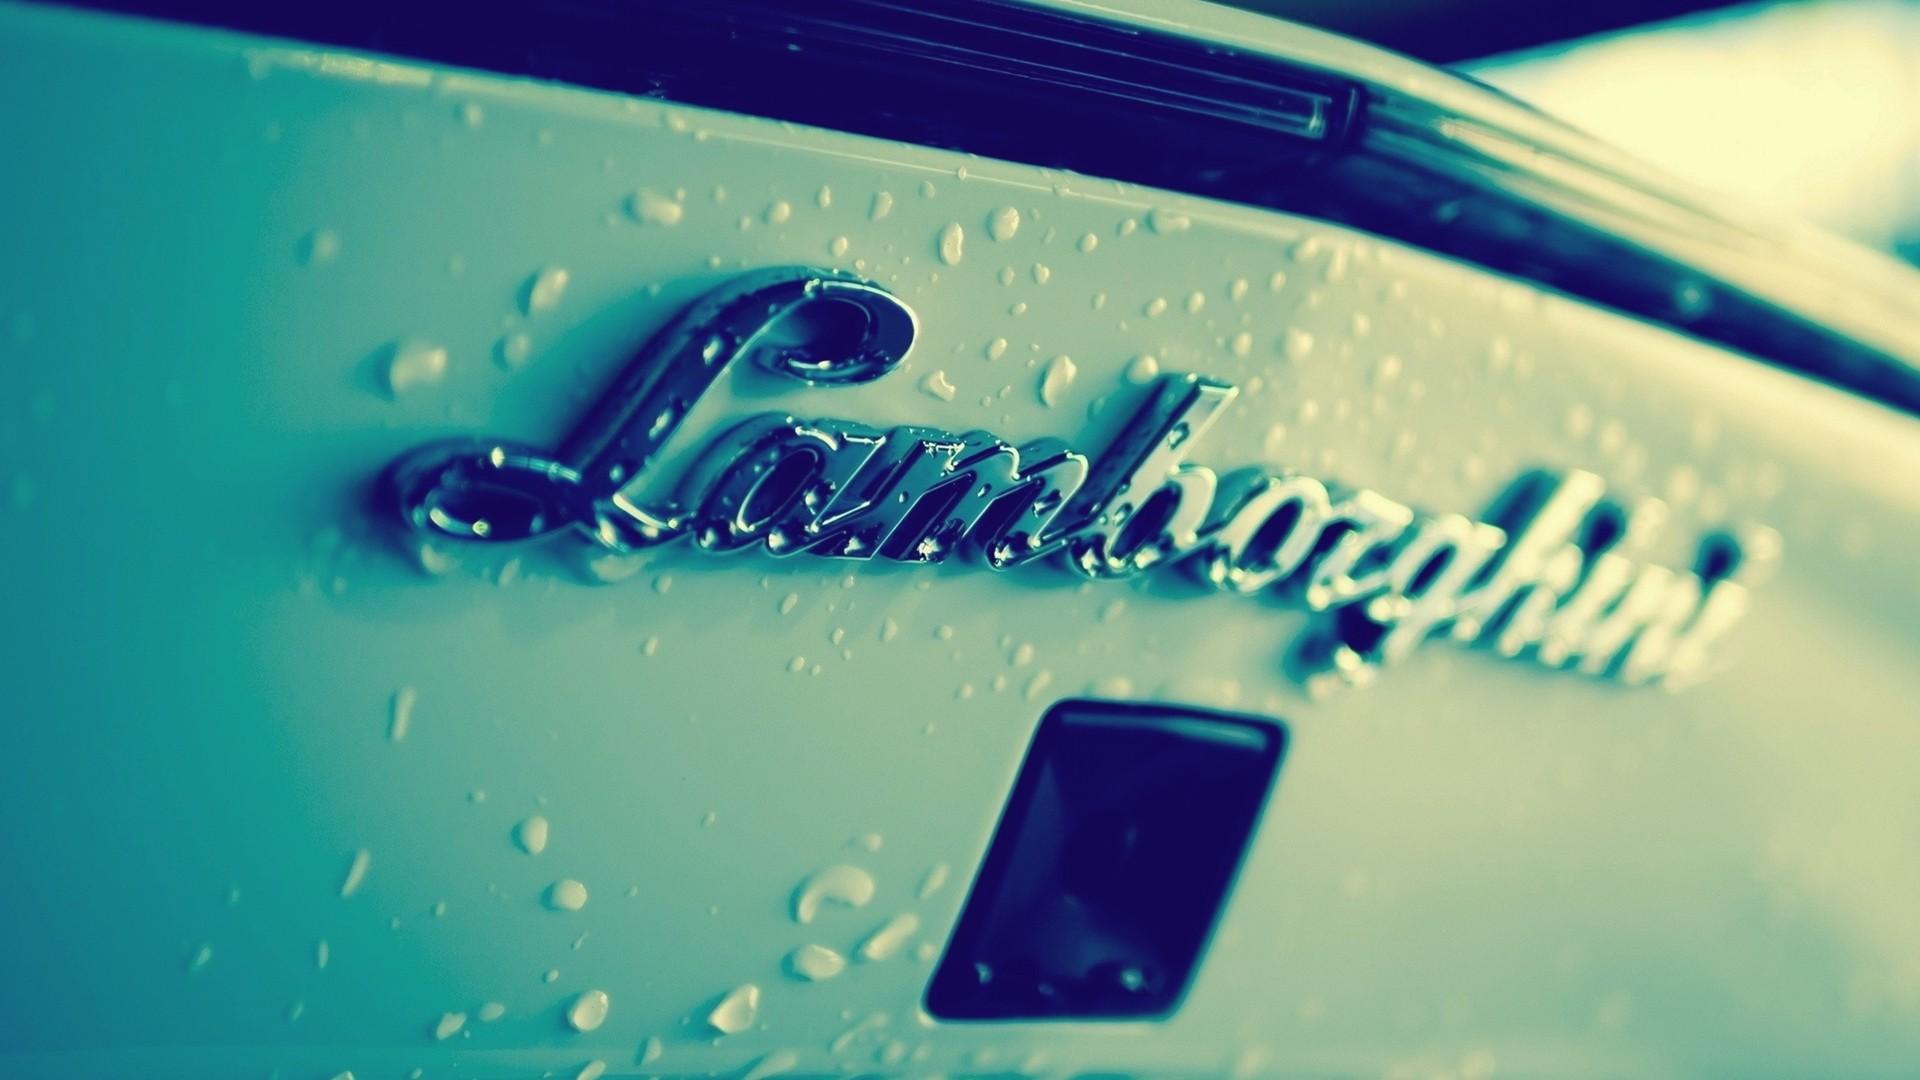 Lamborghini emblem logo hd wallpaper background   HD Wallpapers 1920x1080